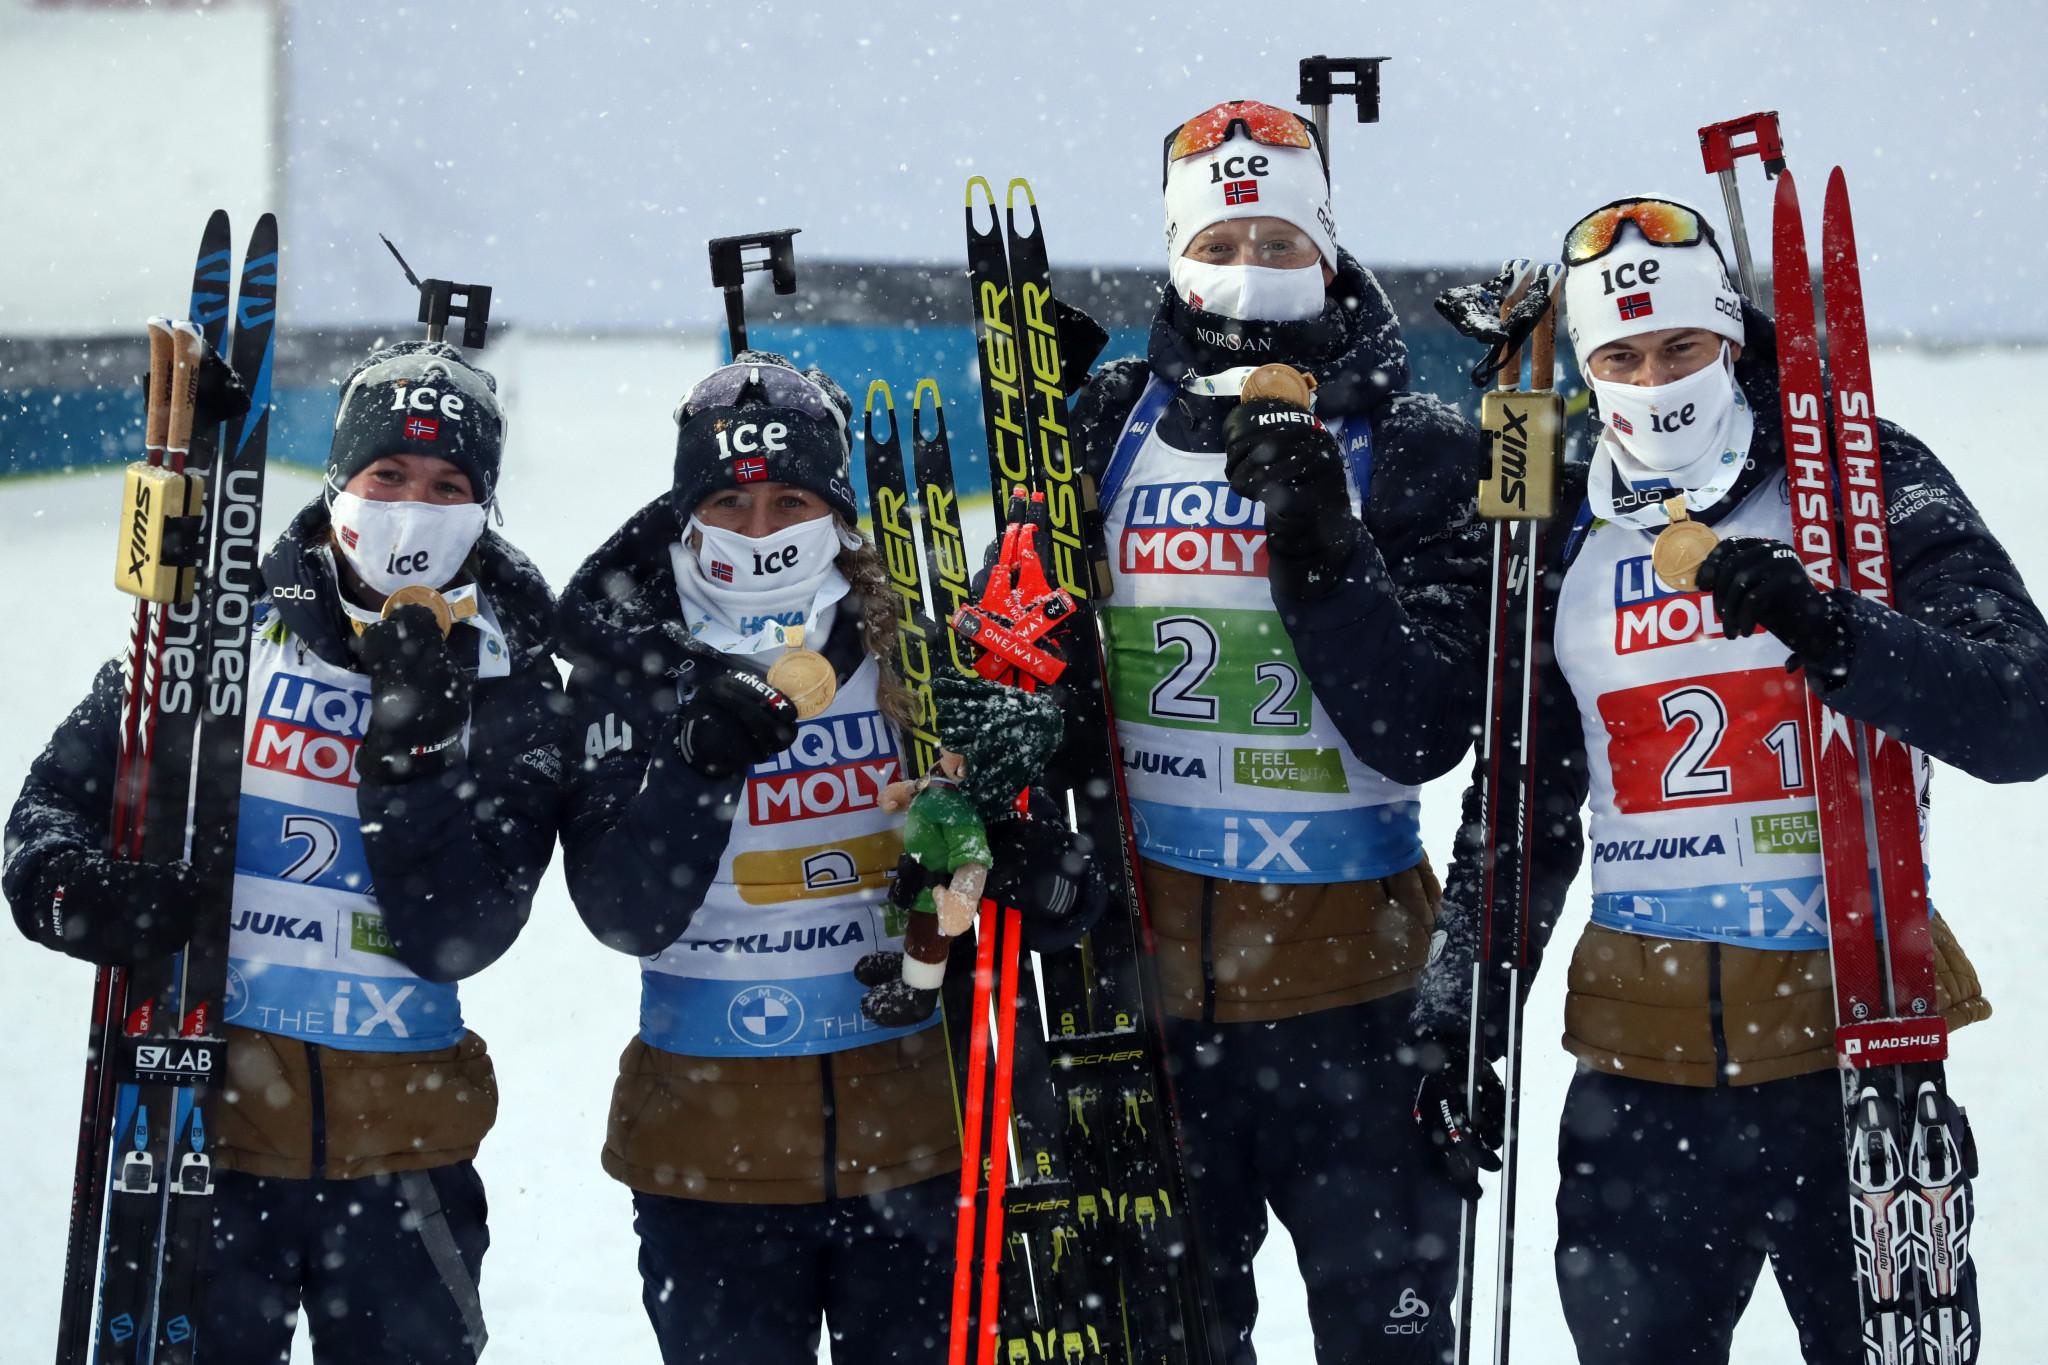 Norway triumph in mixed relay as IBU World Championships begin in Pokljuka